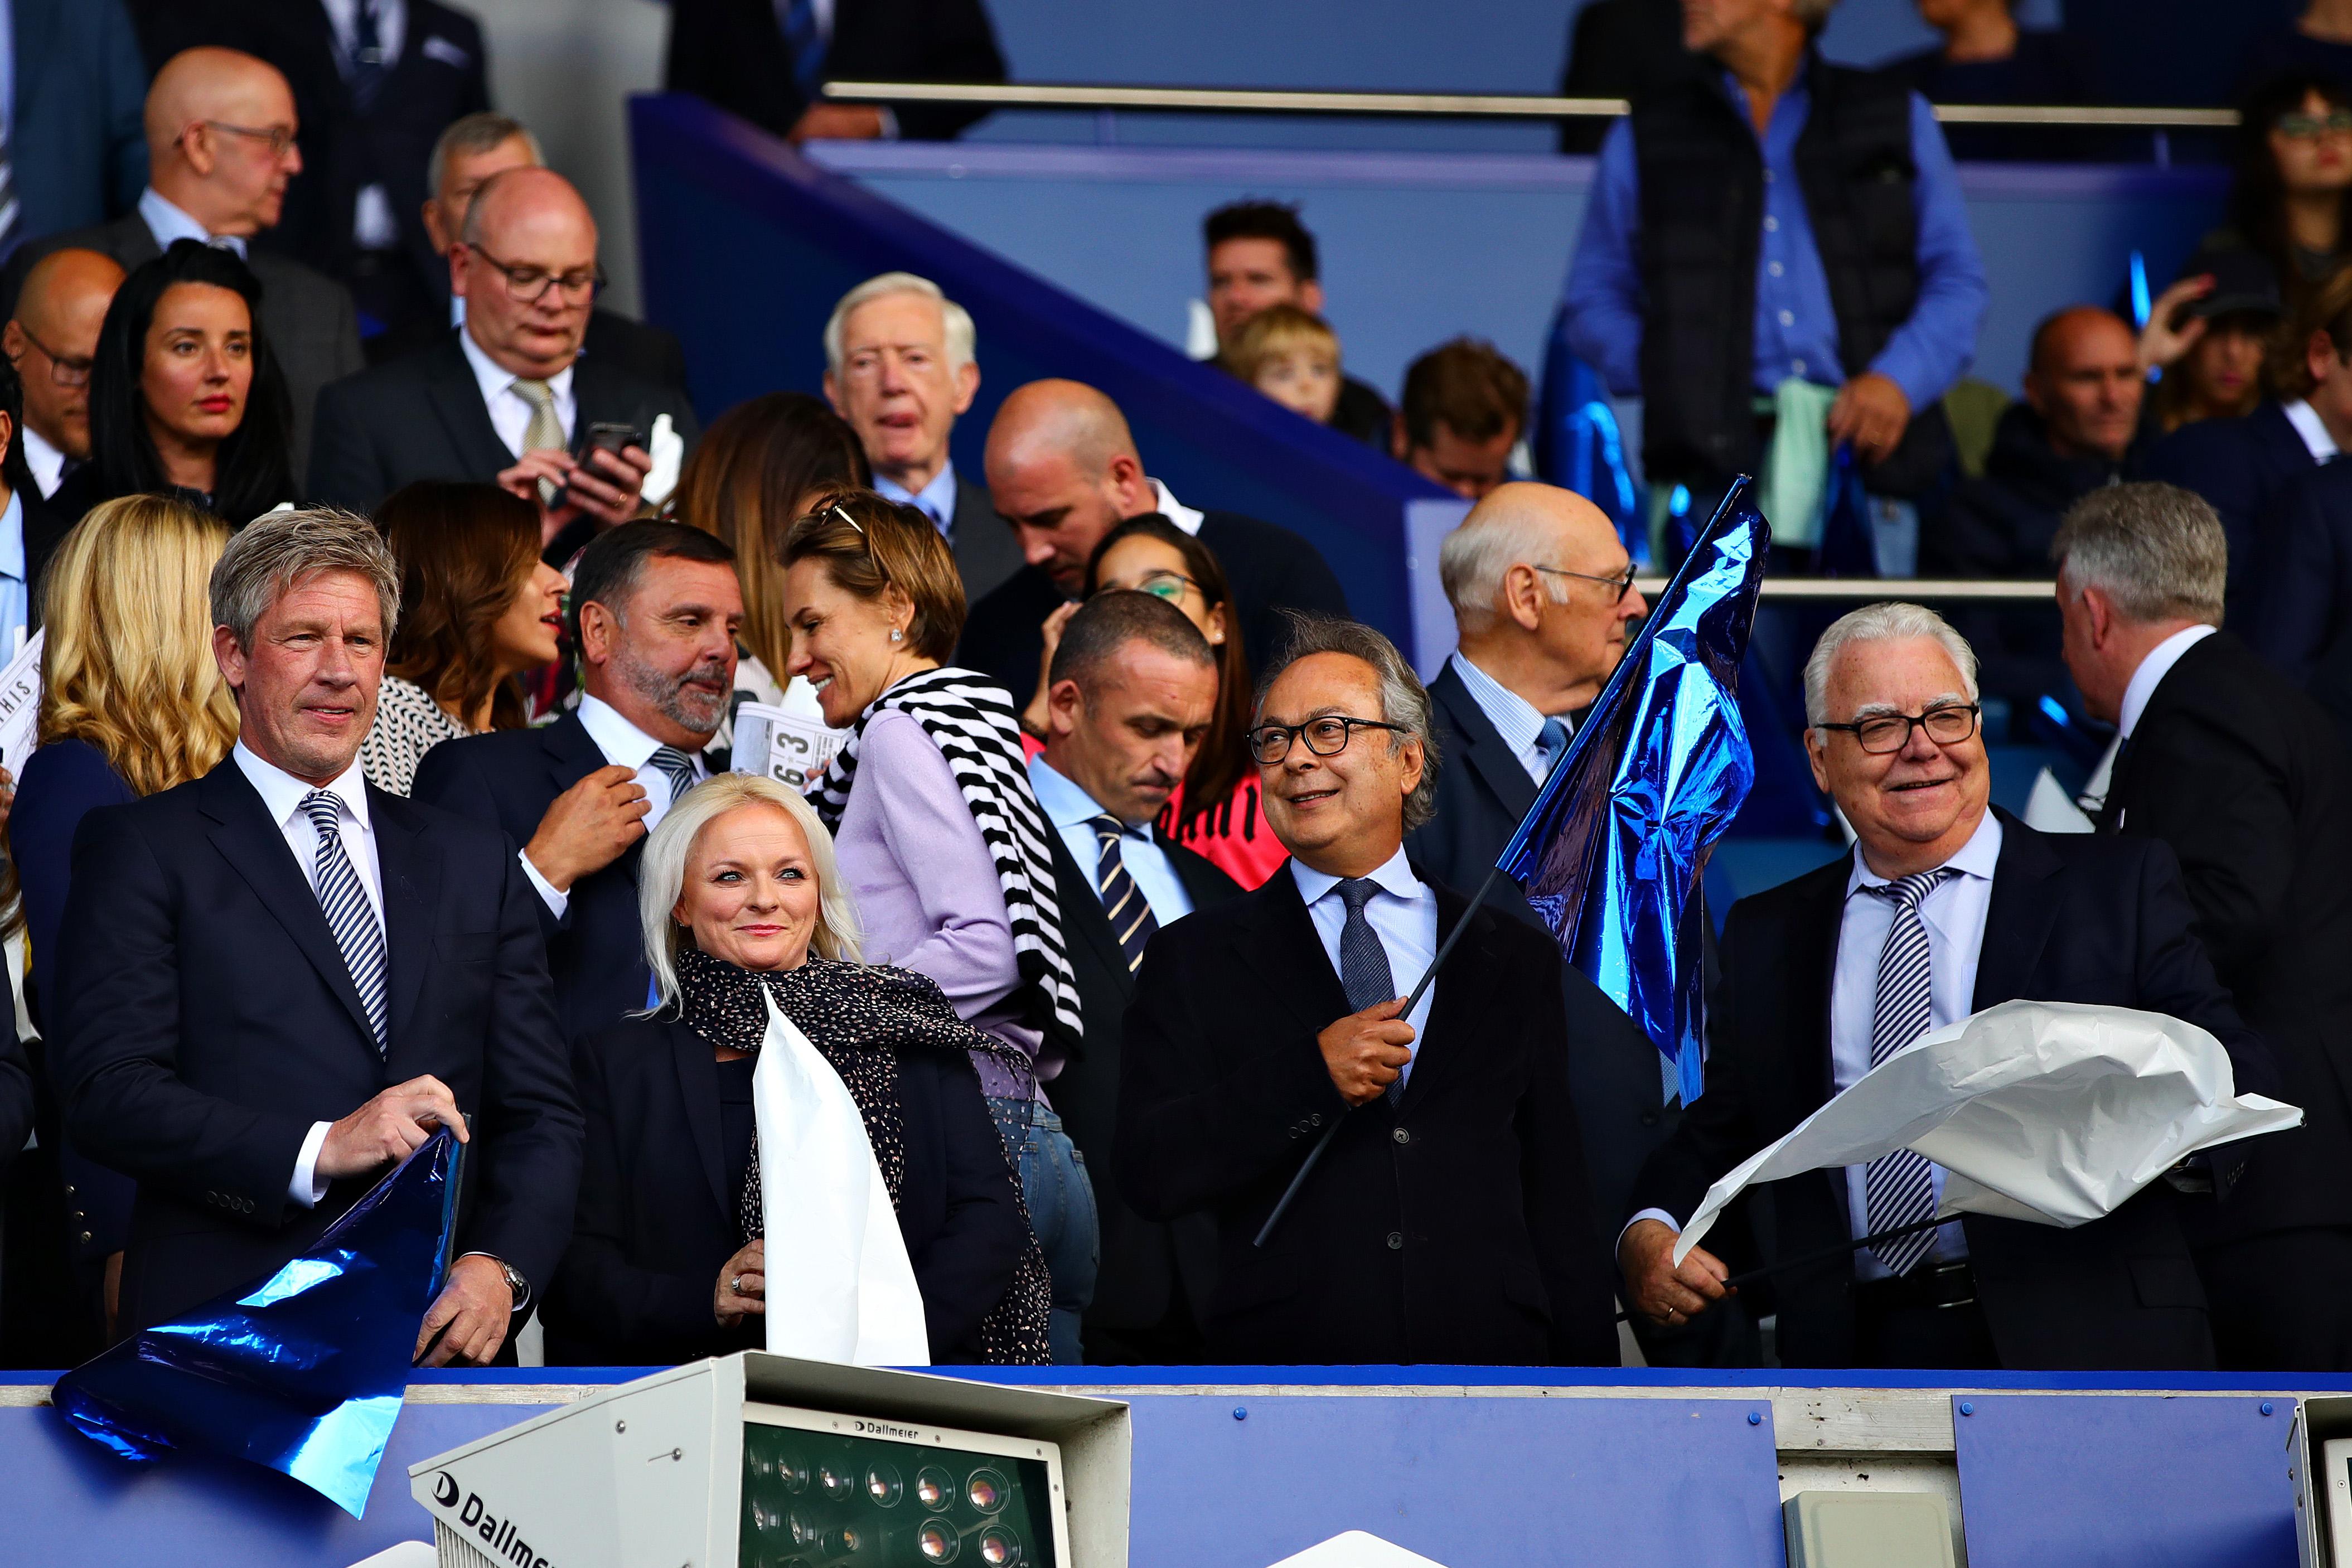 Everton's leadership group